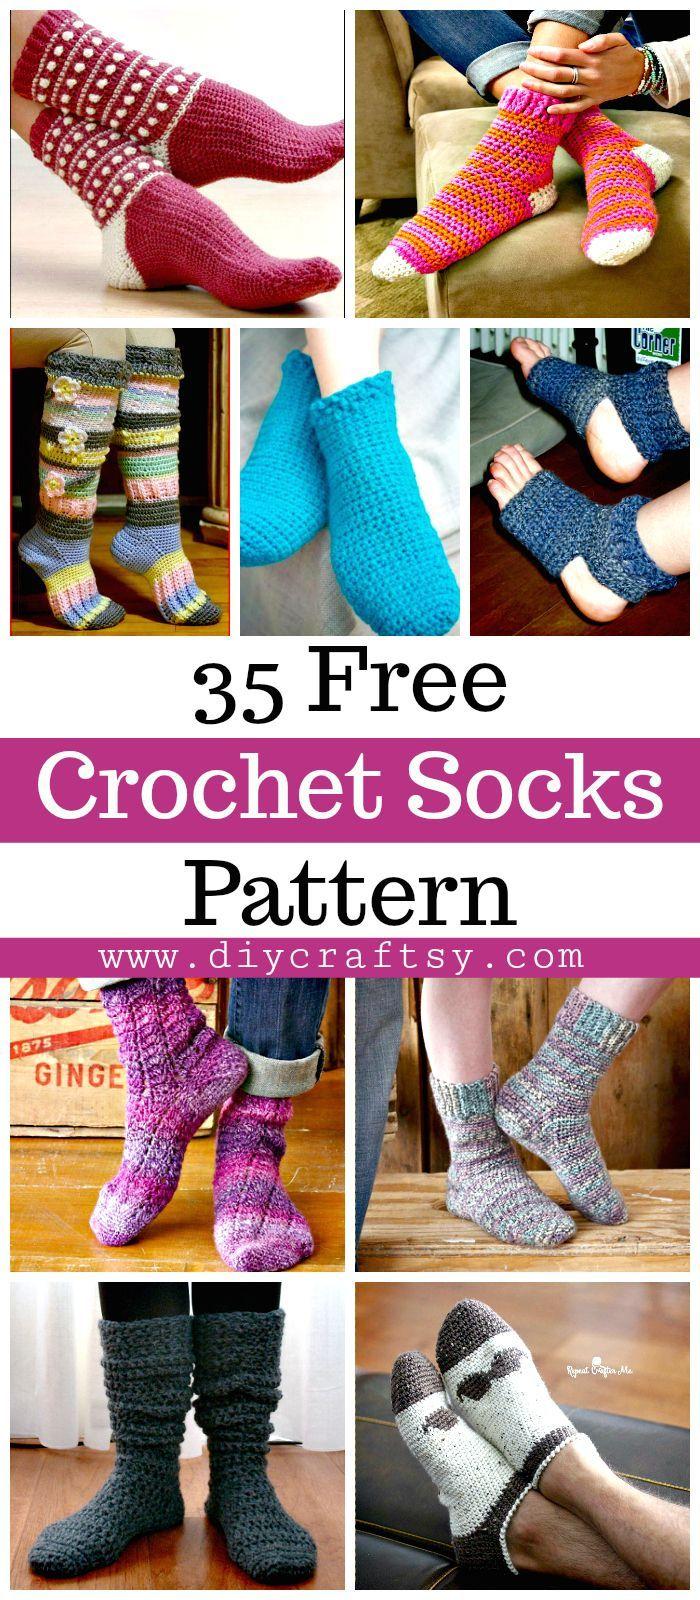 Crochet Socks - 35 Free Crochet Socks Pattern - DIY & Crafts